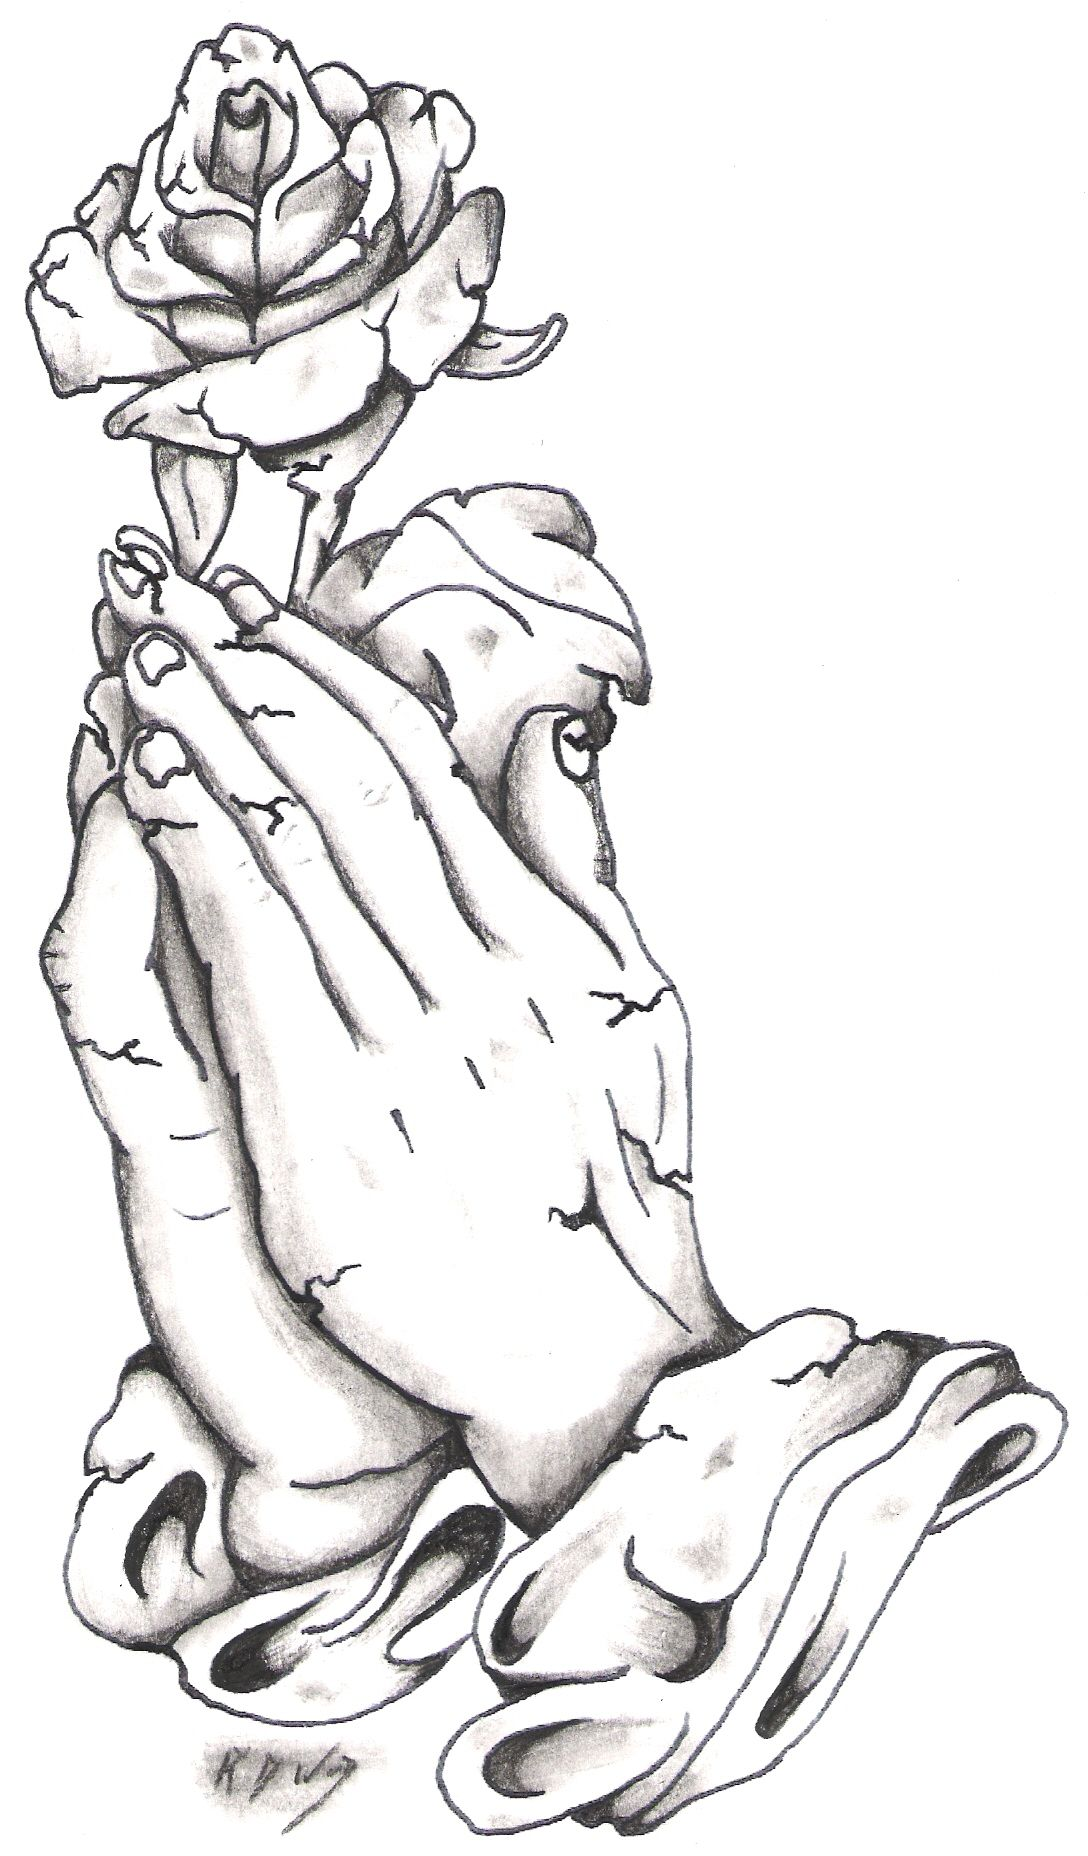 Prayer hands tattoos designs - Prayer Hands I Would Love To Get